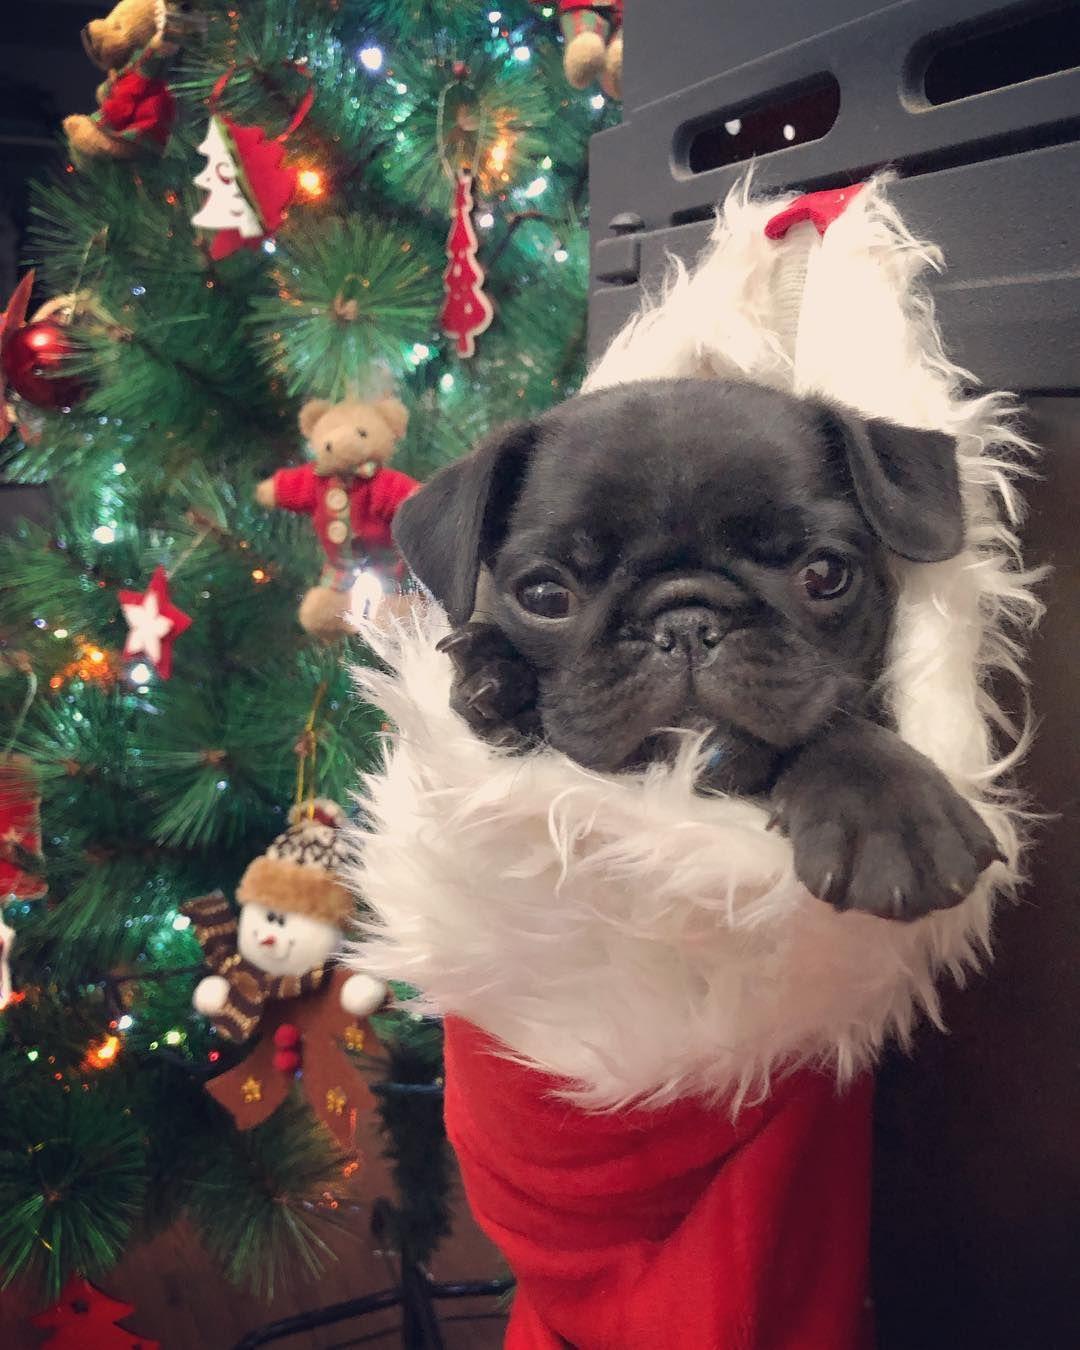 Pin By Lisa Guedry On Pugs Baby Pugs Cute Pugs Pug Christmas